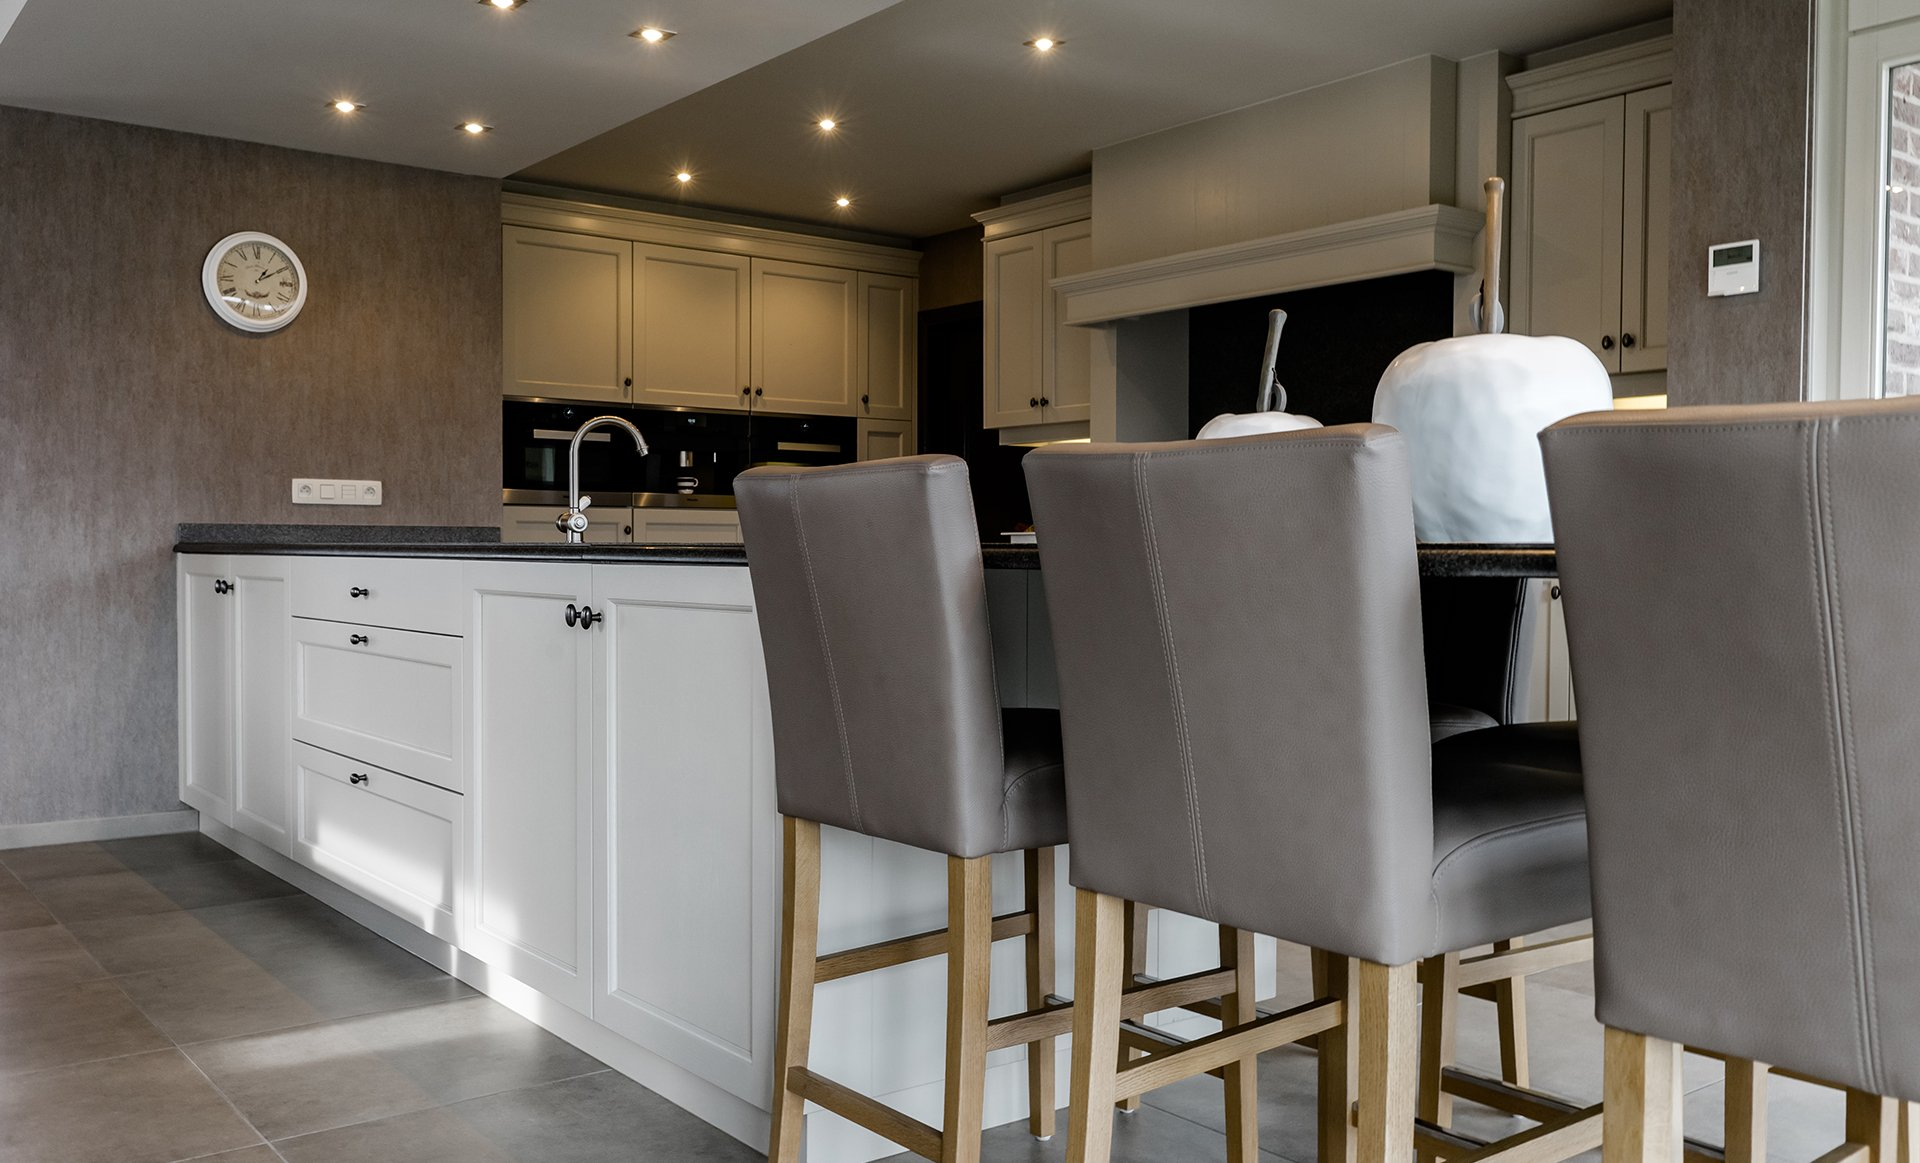 g-design: keukens & interieur op maat., Deco ideeën